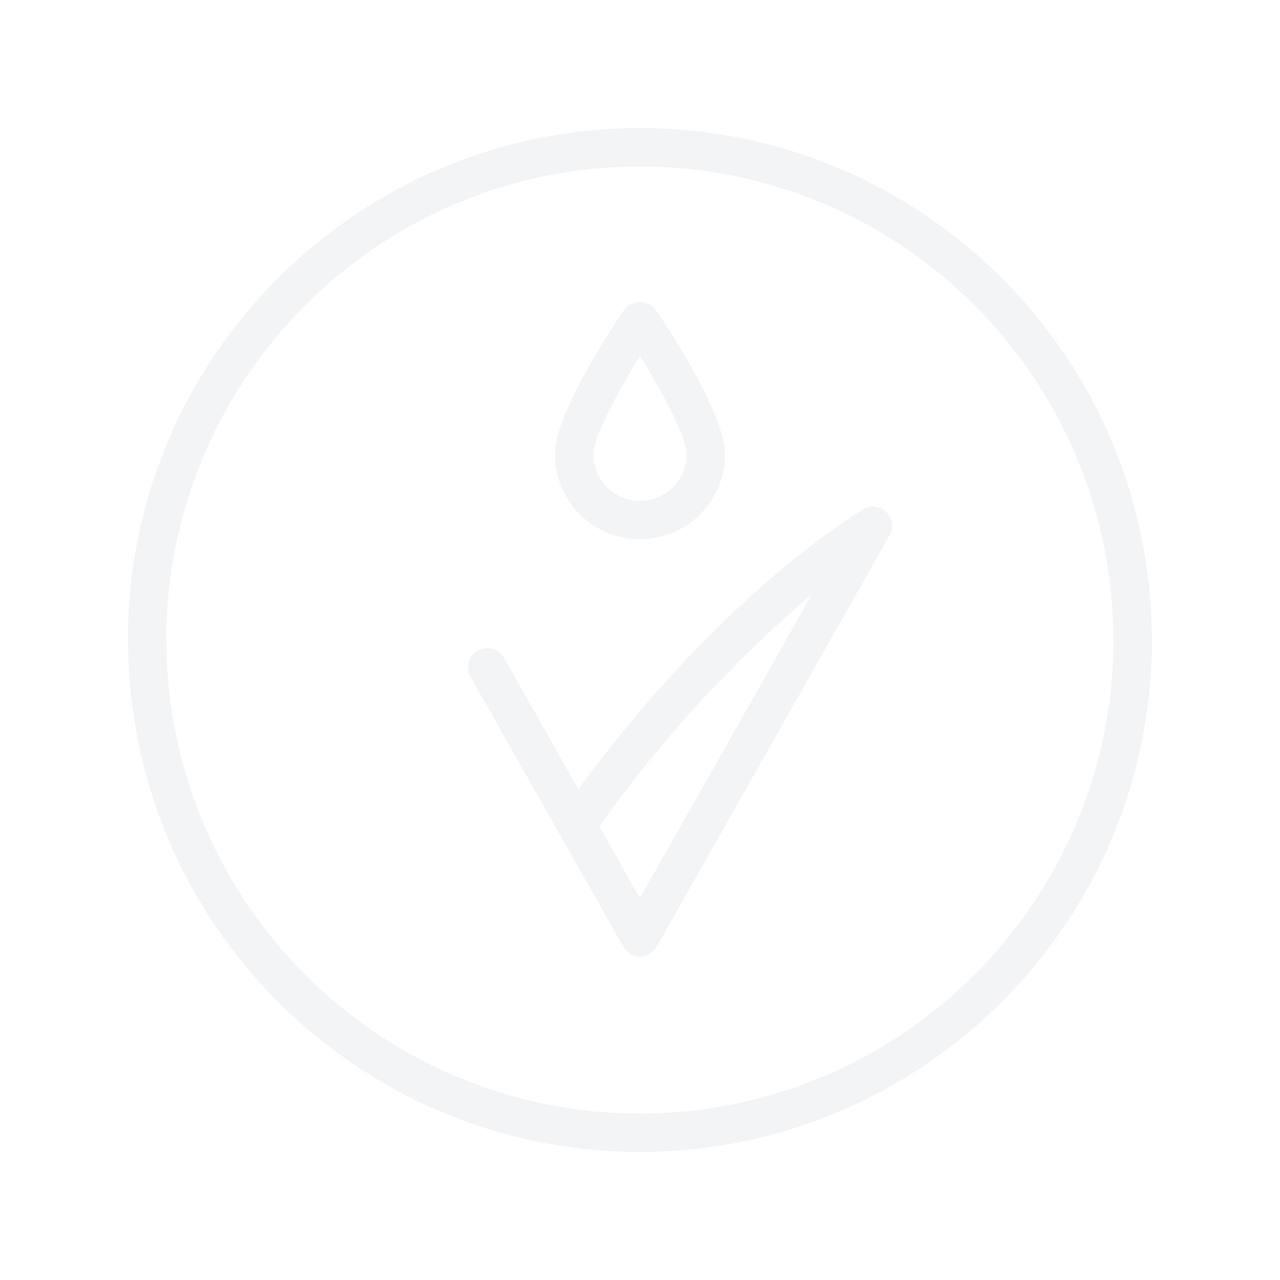 Wella Professionals EIMI Dry Me Dry Shampoo 65ml